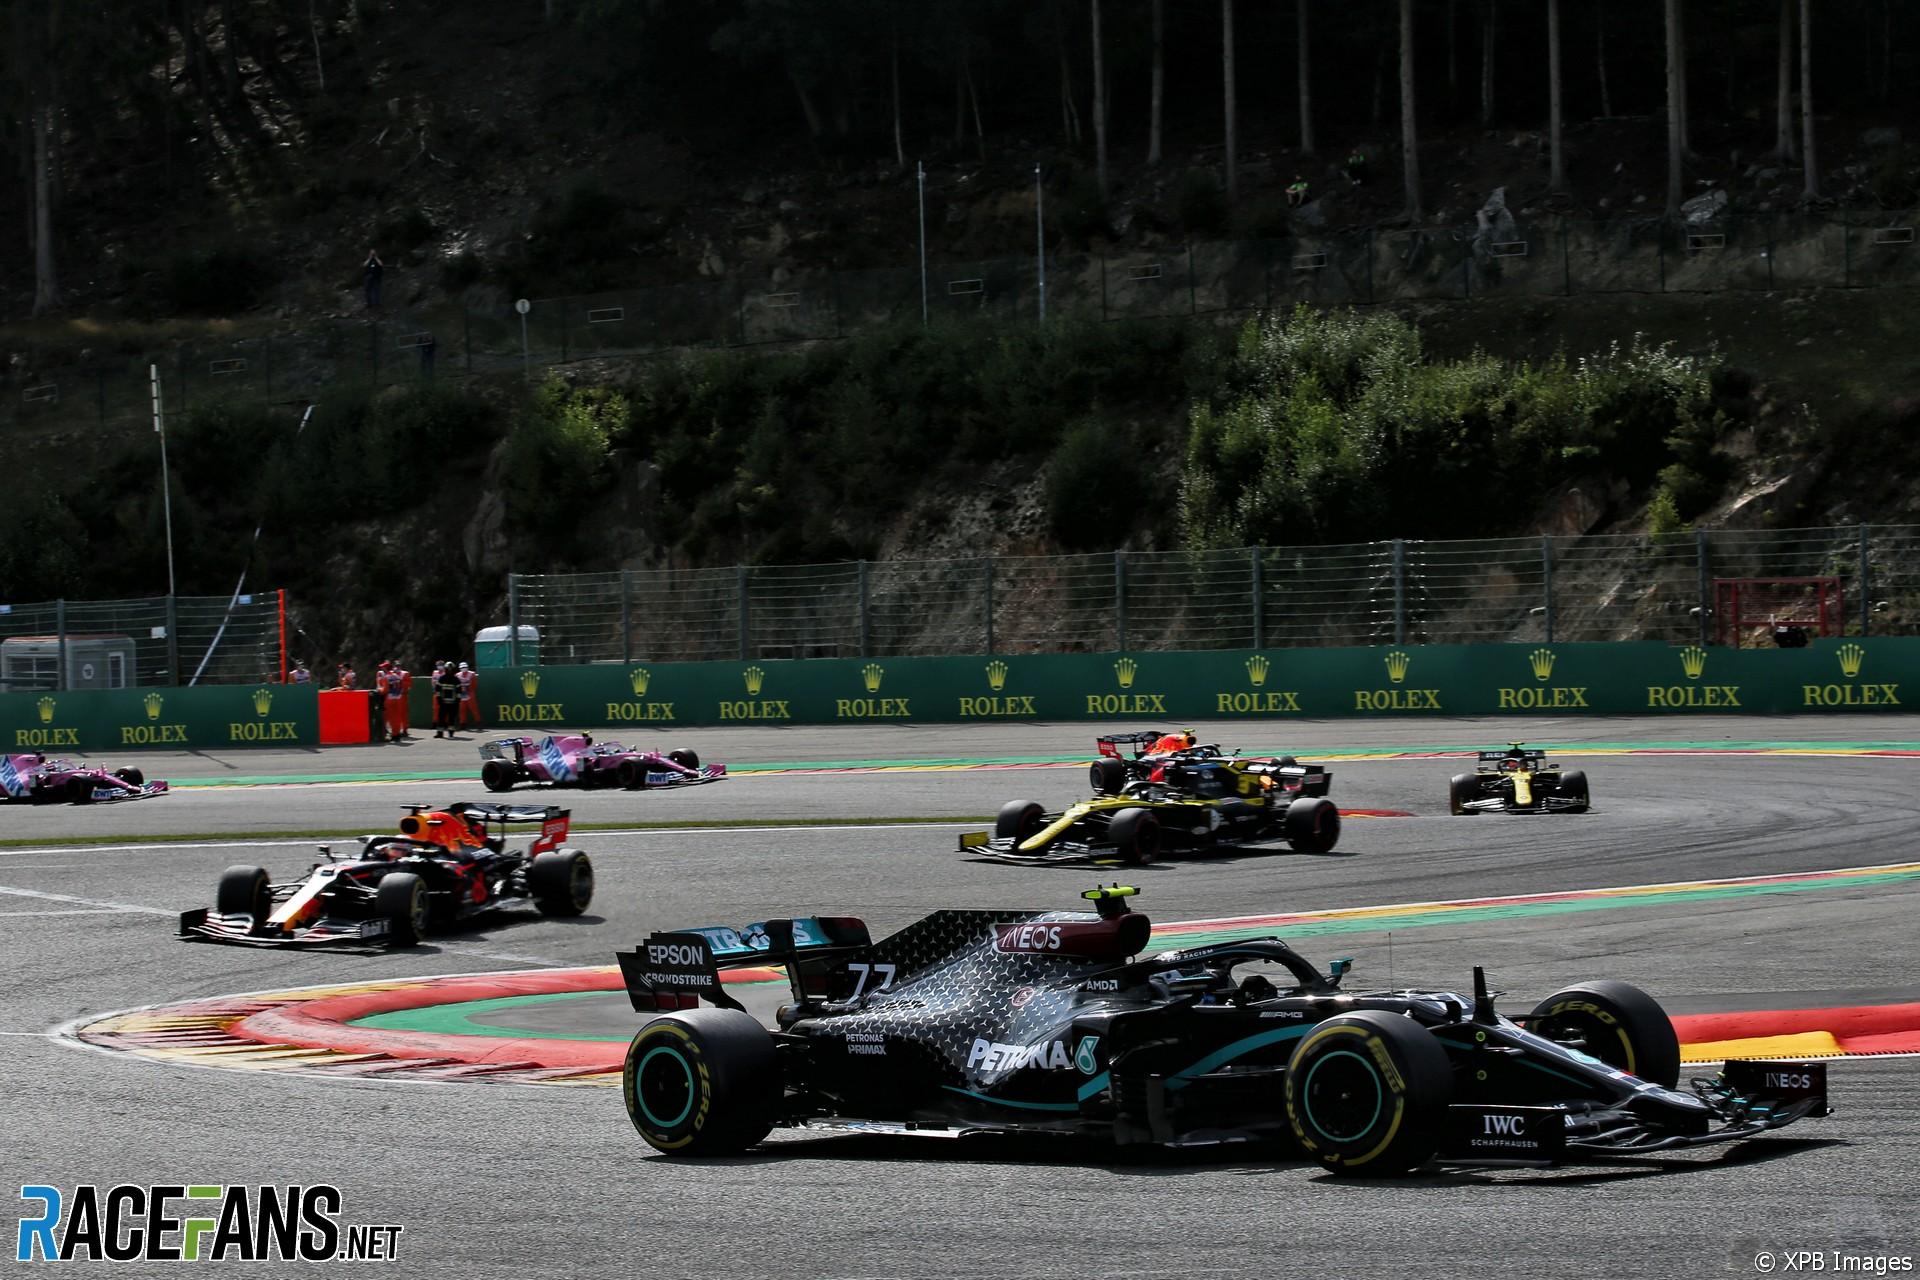 Valtteri Bottas, Mercedes, Spa-Francorchamps, 2020